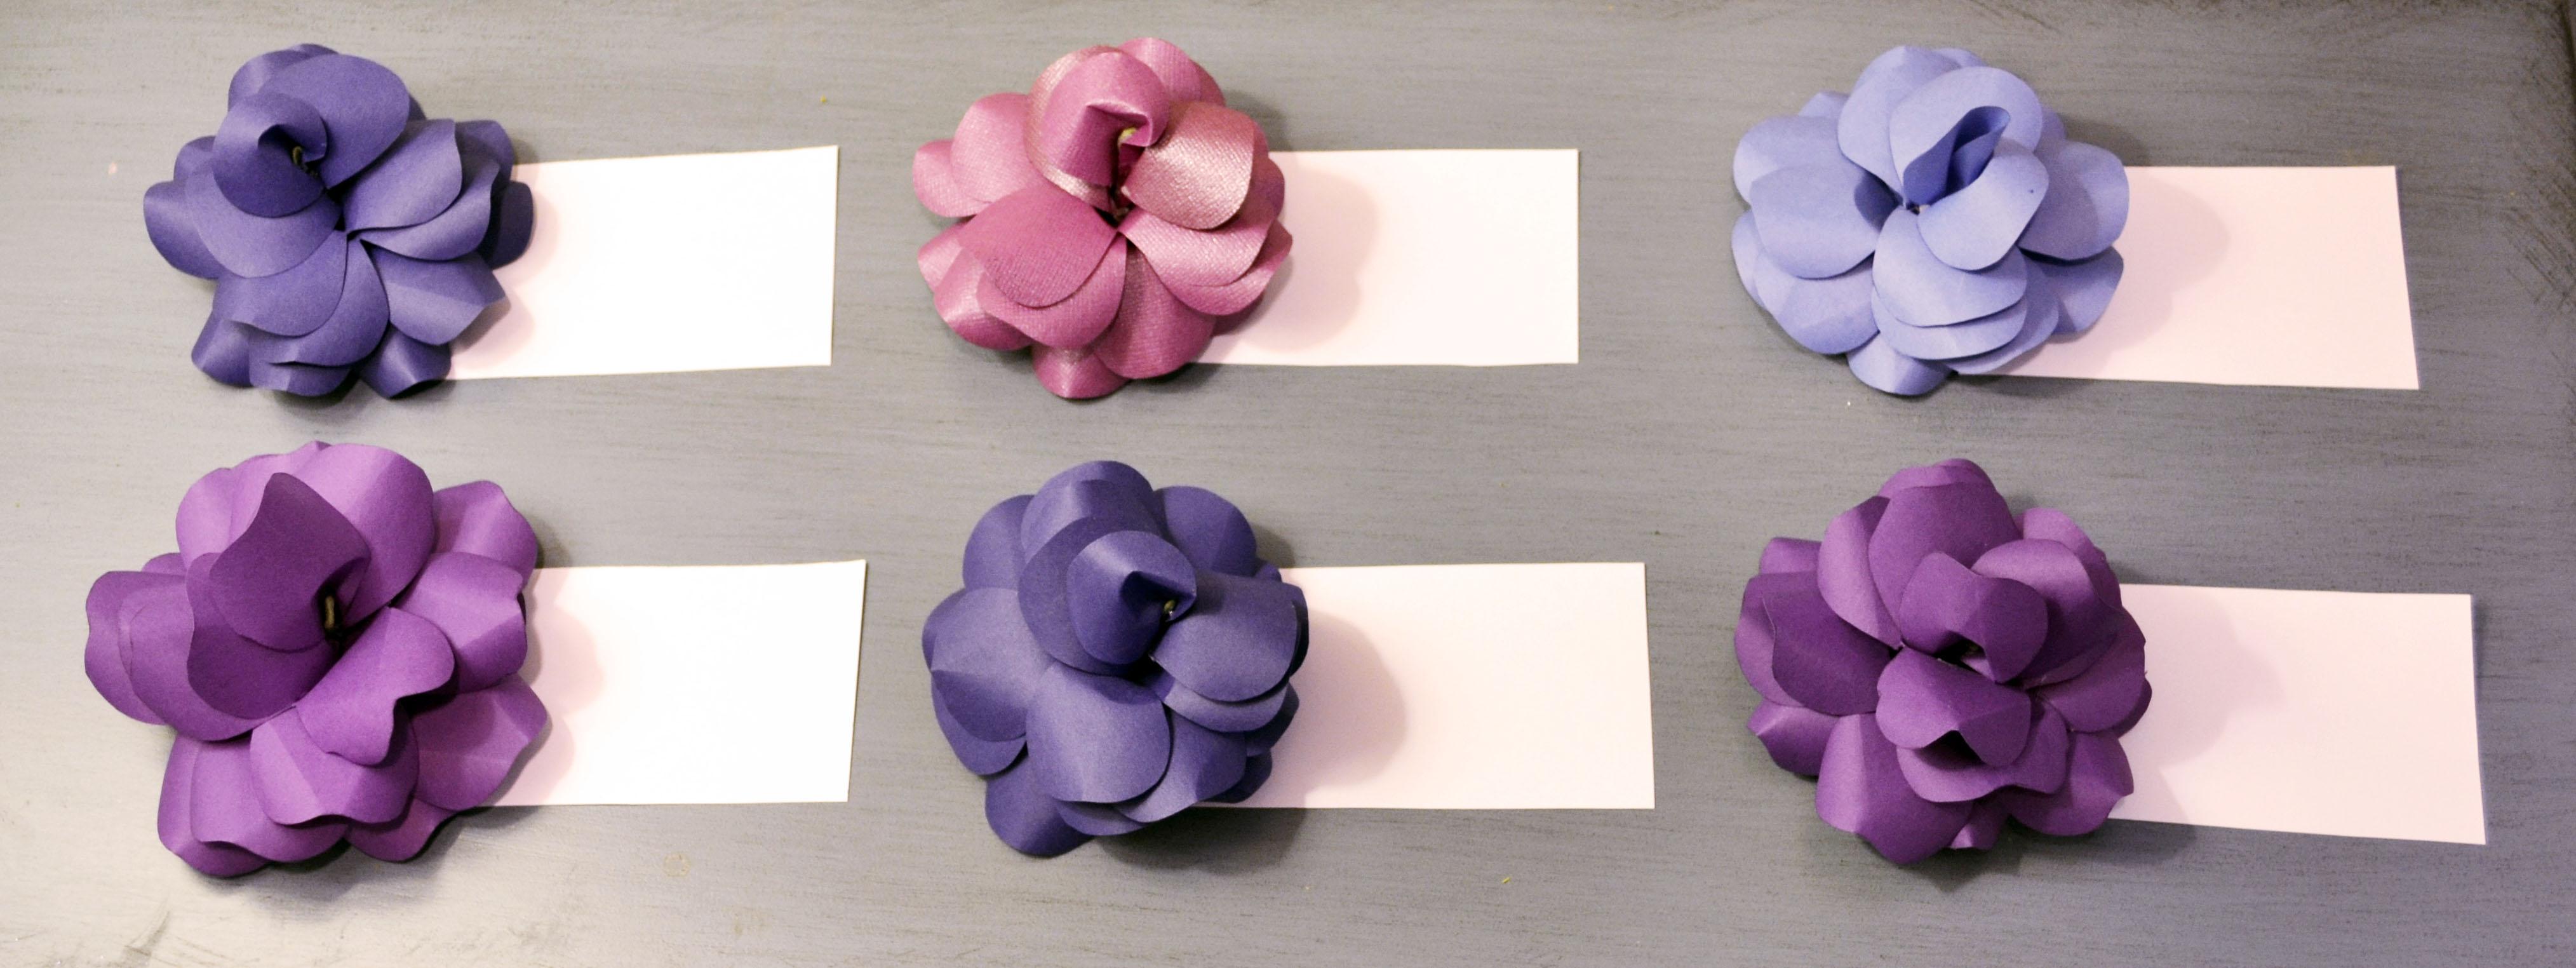 Diy Paper Flowers Unique Escort Cards For Your Wedding Miss Bizi Bee